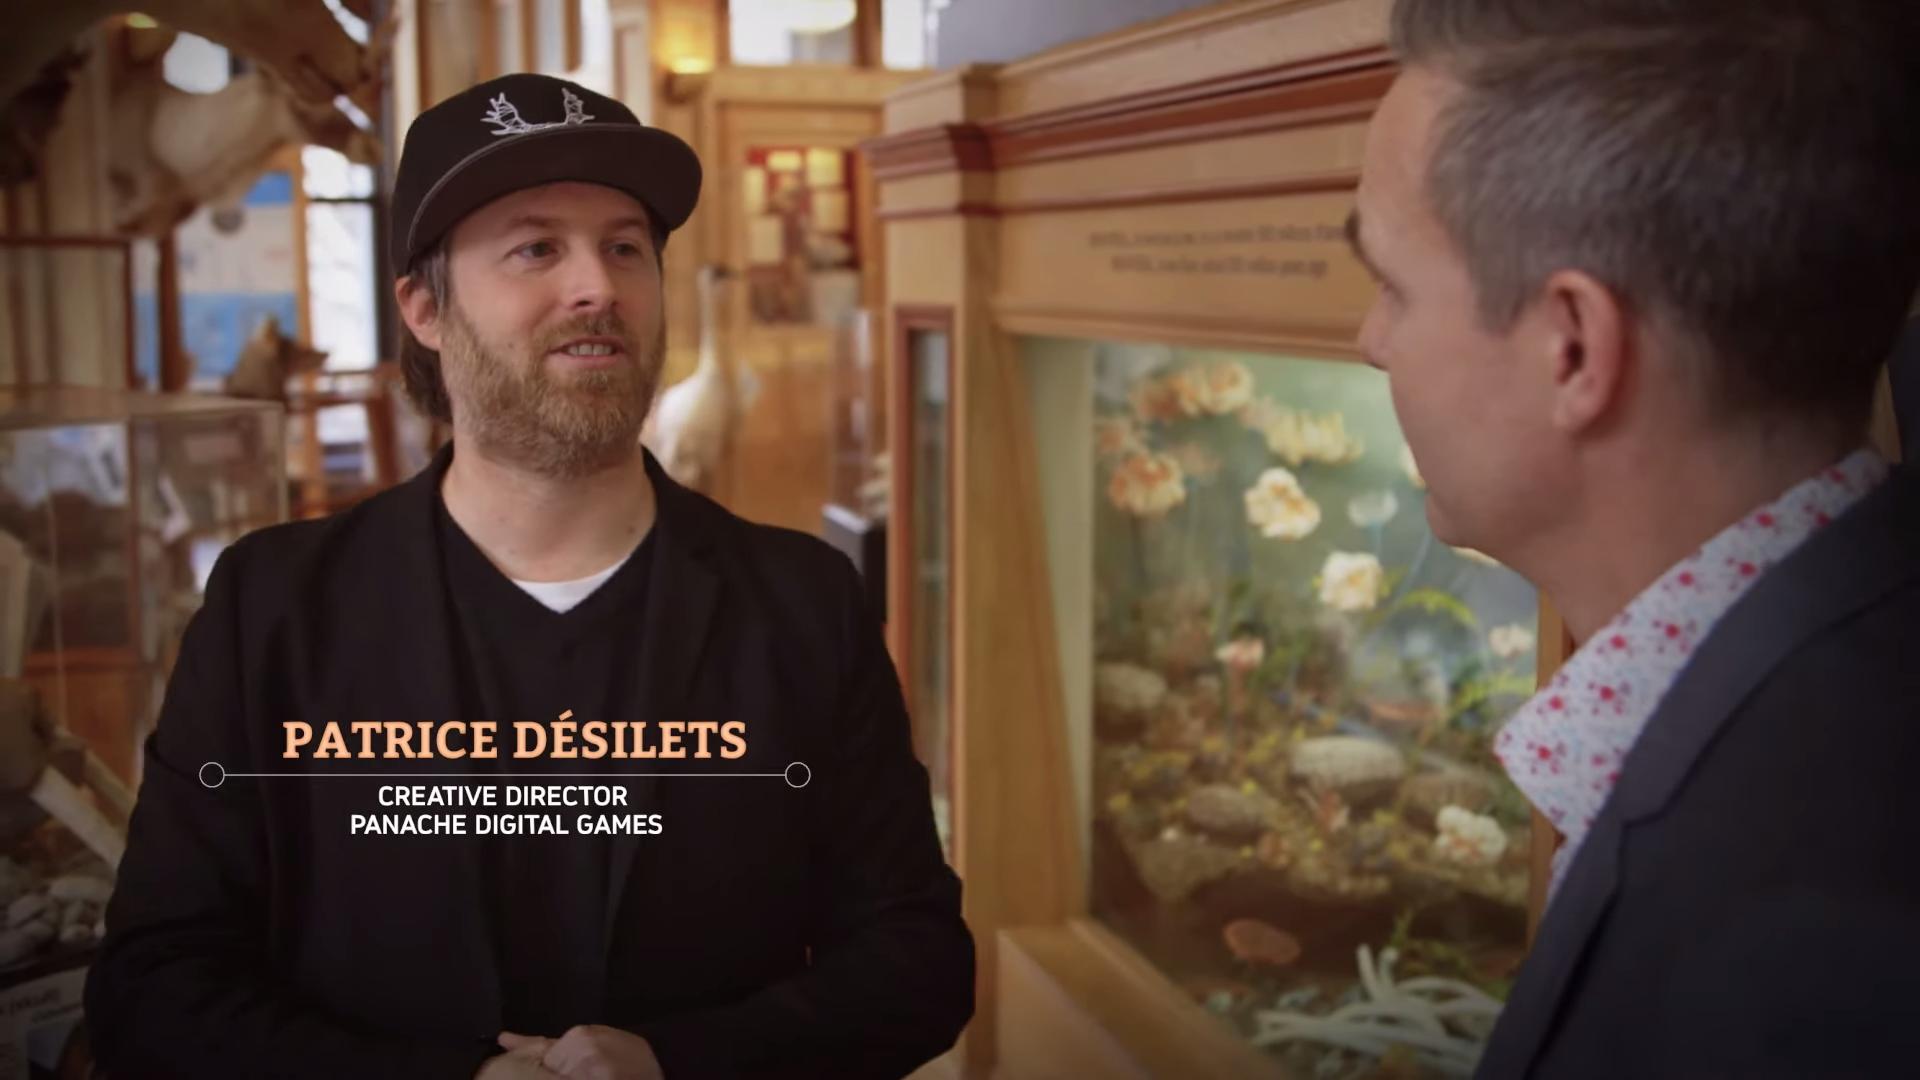 Ancestors: The Humankind Odyssey Experiences video series kicks off